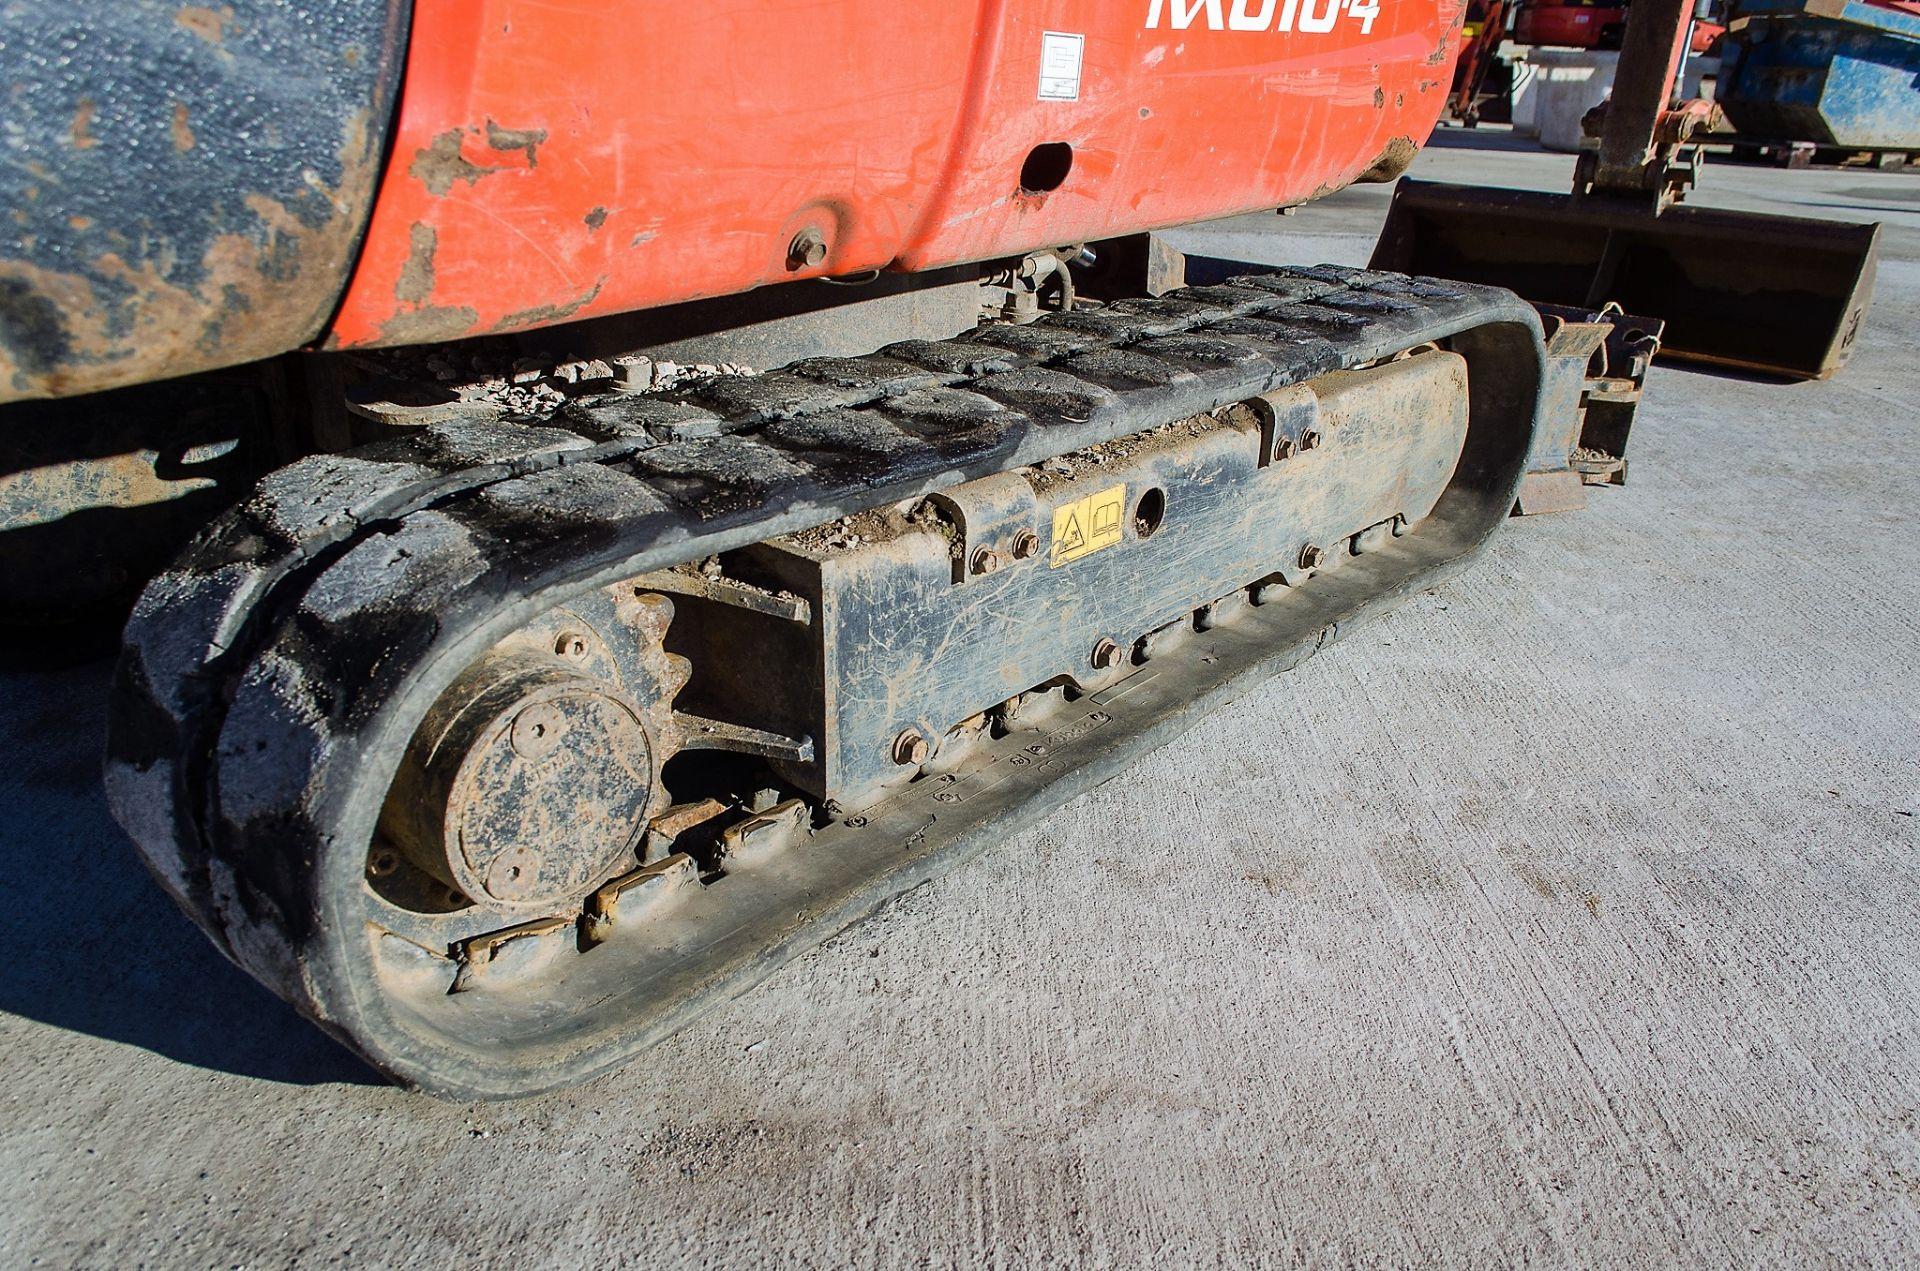 Kubota KX016-4 1.5 tonne rubber tracked mini excavator Year: 2015 S/N: 58688 Recorded Hours: 1736 - Image 10 of 19